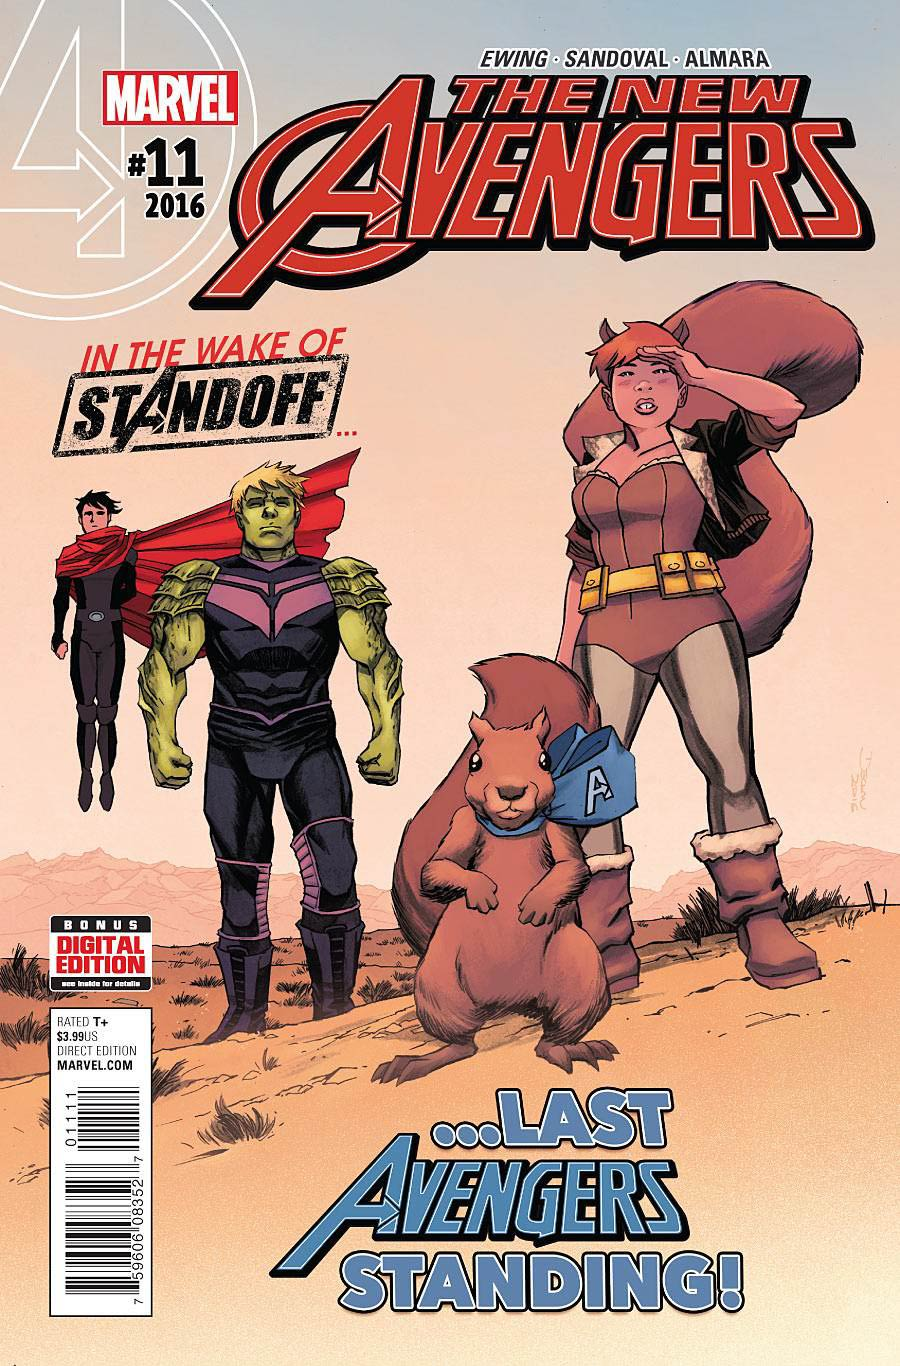 New Avengers Vol 4 #11